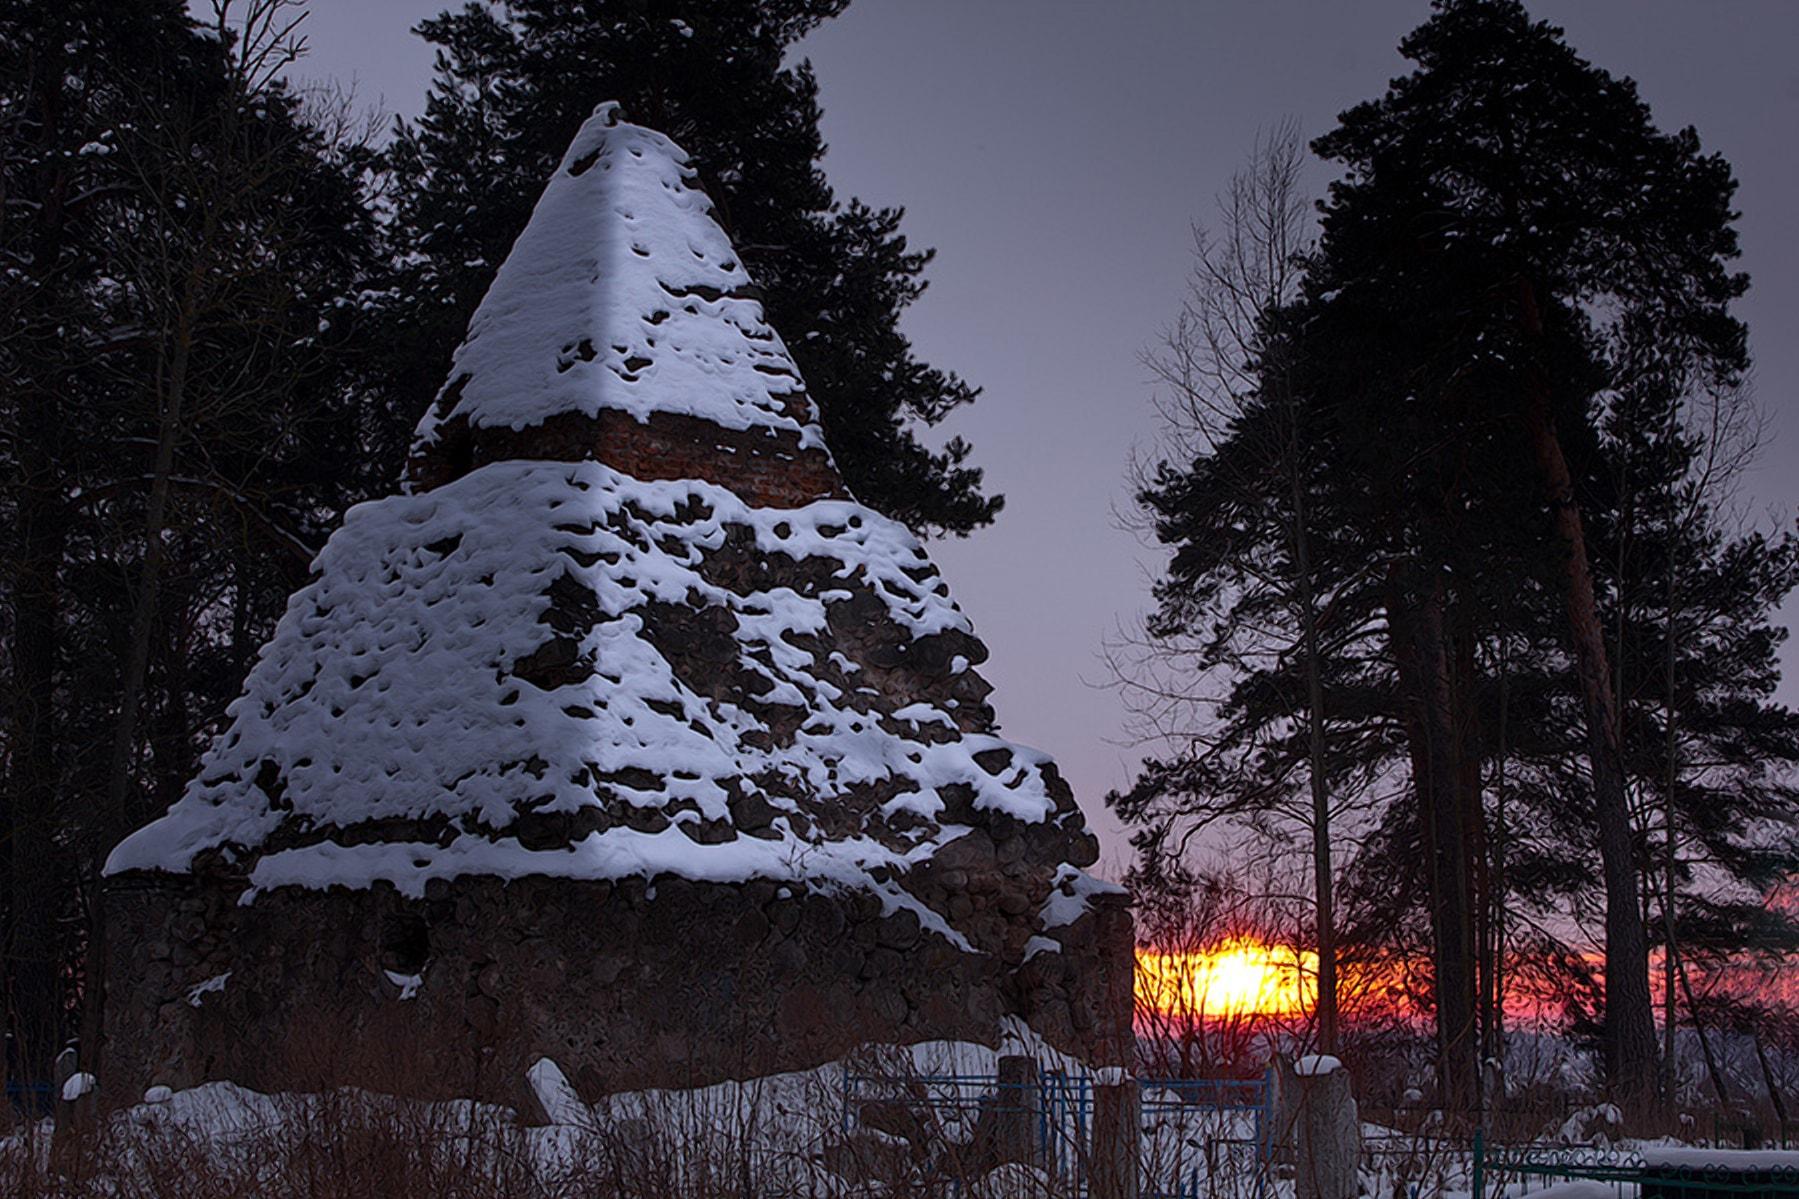 Пирамида-обелиск в Узде